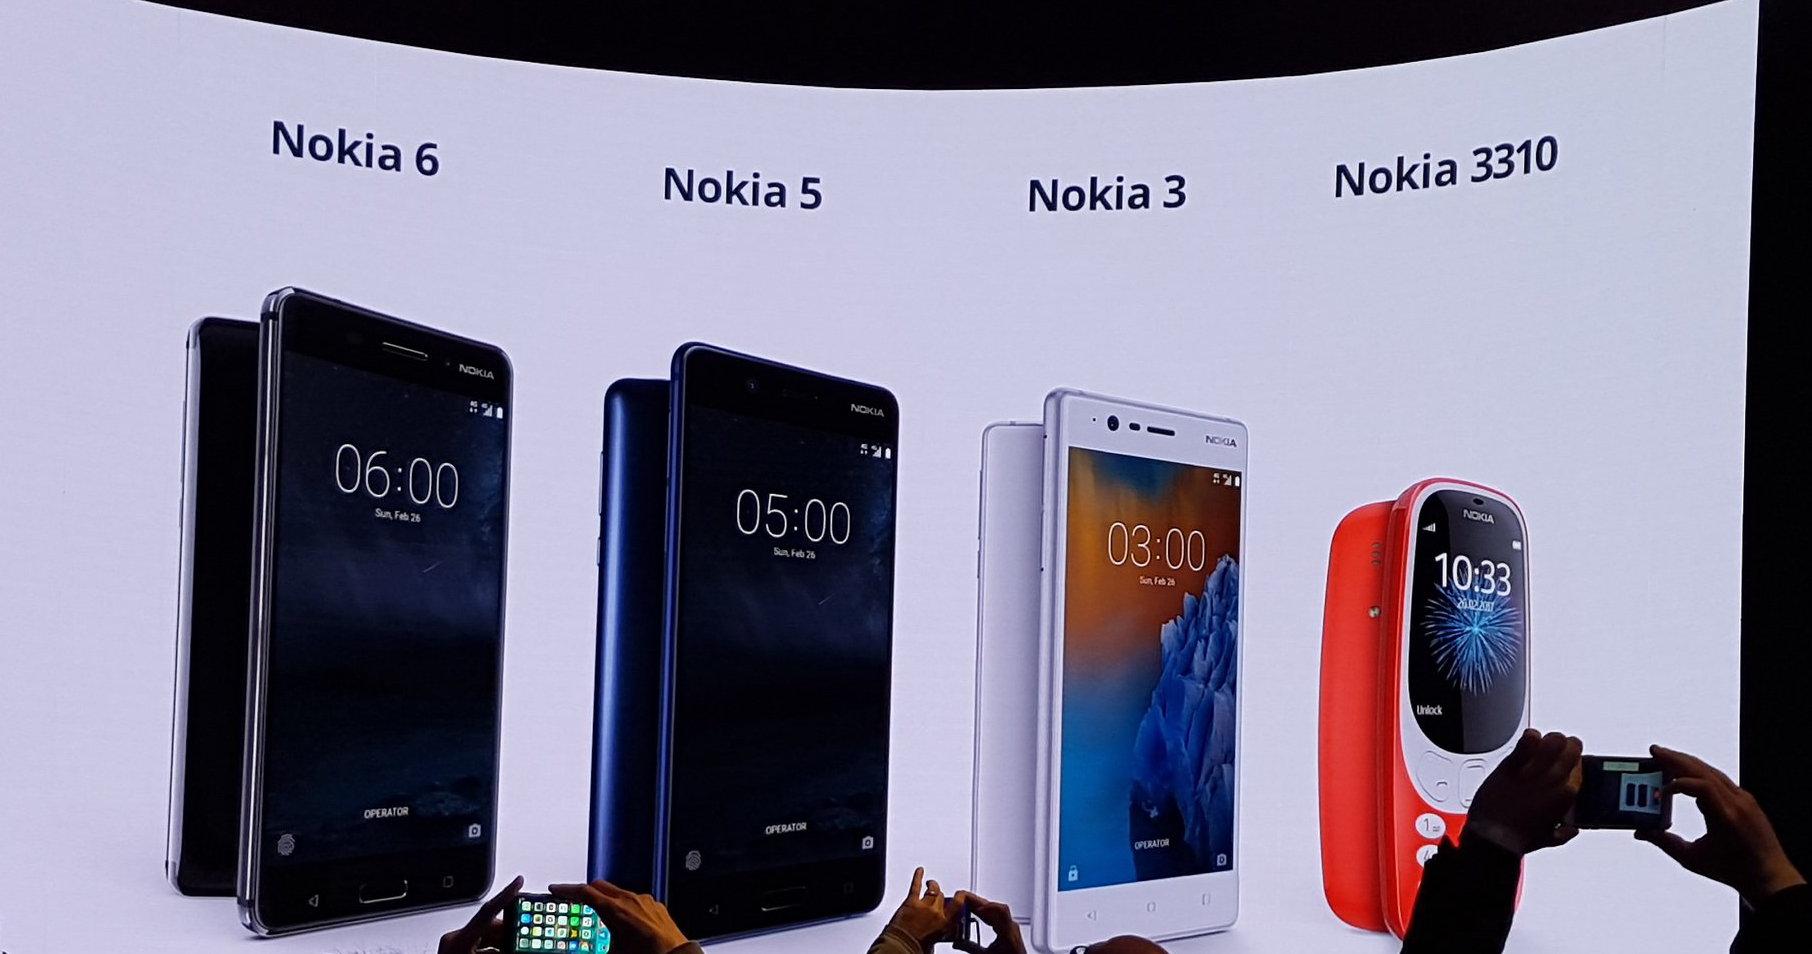 Nokia 3310 3 5 6 - Nokia a gonfie vele, tre nuovi smartphone per tutti i gusti